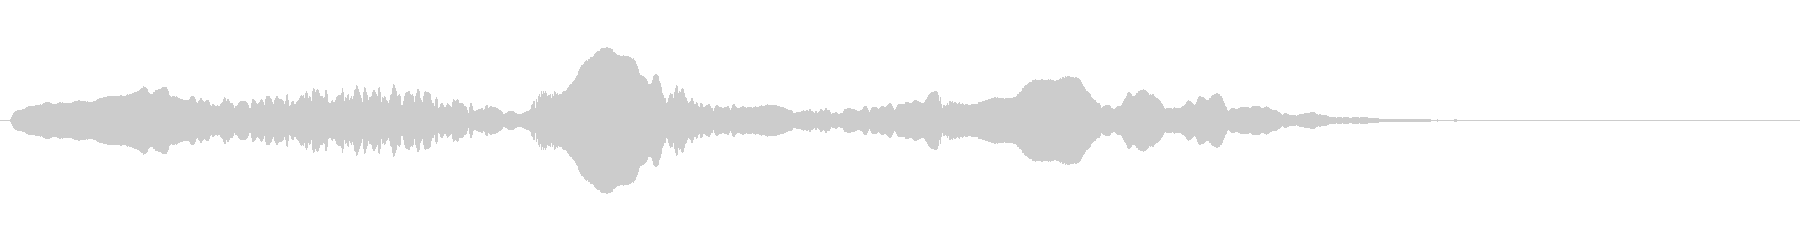 尺八 生演奏 古典風#11の未再生の波形